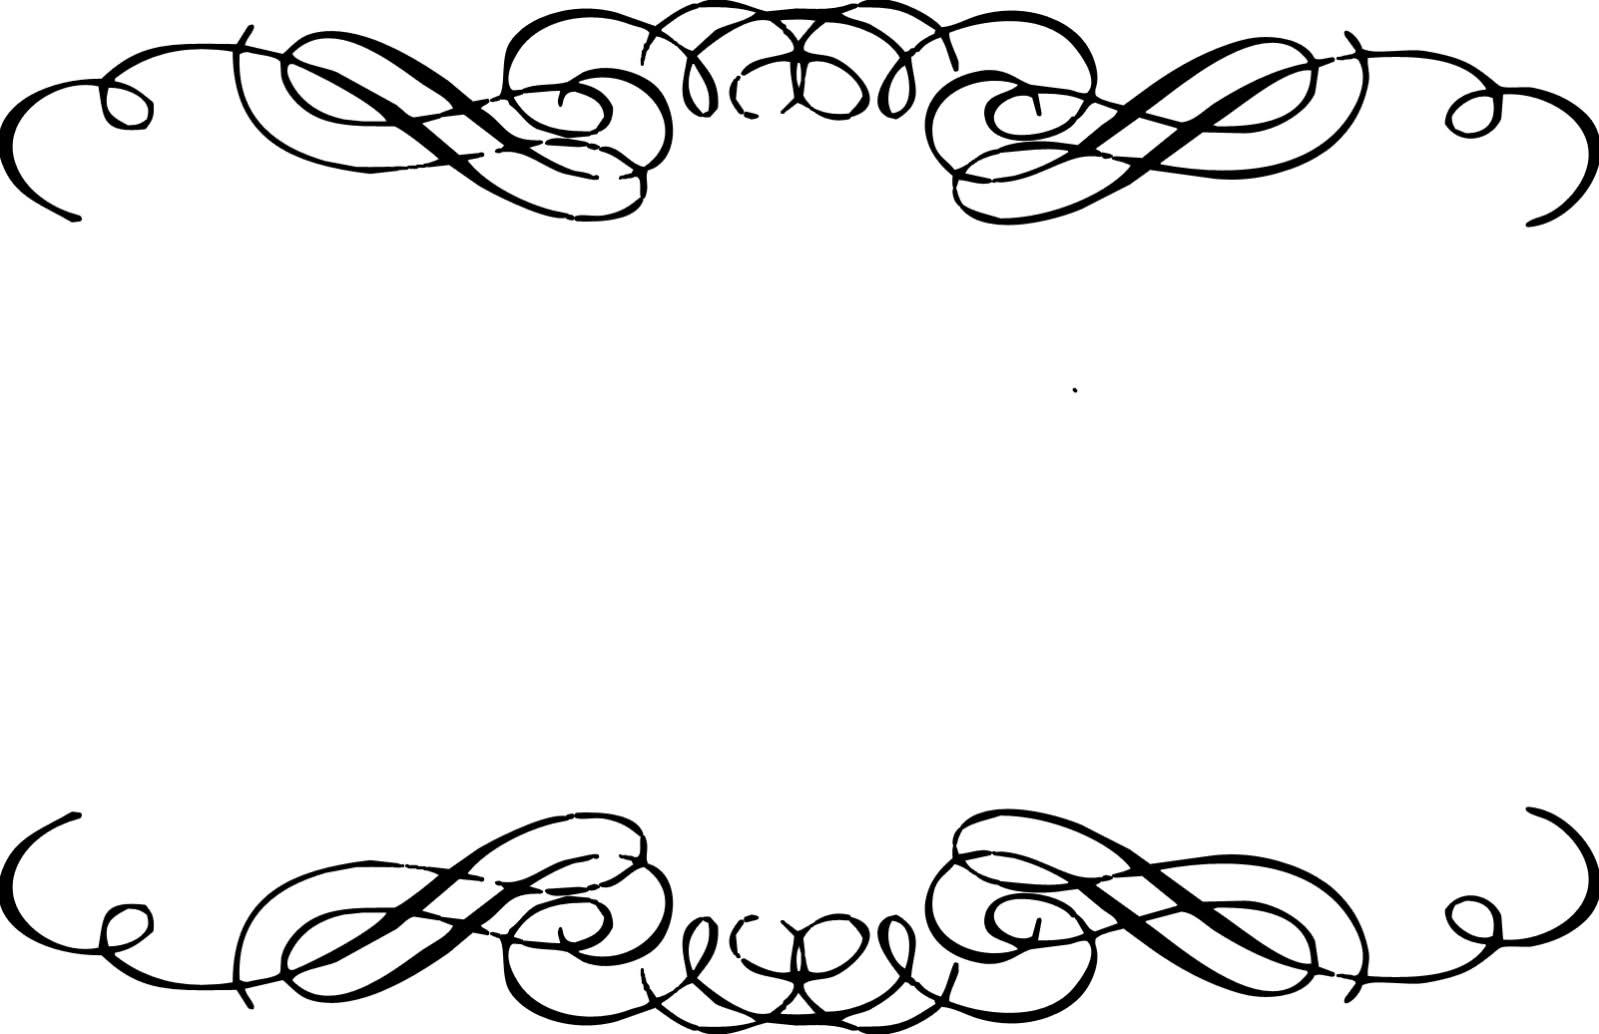 1599x1034 Decorative Scroll Clip Art Free Clipart